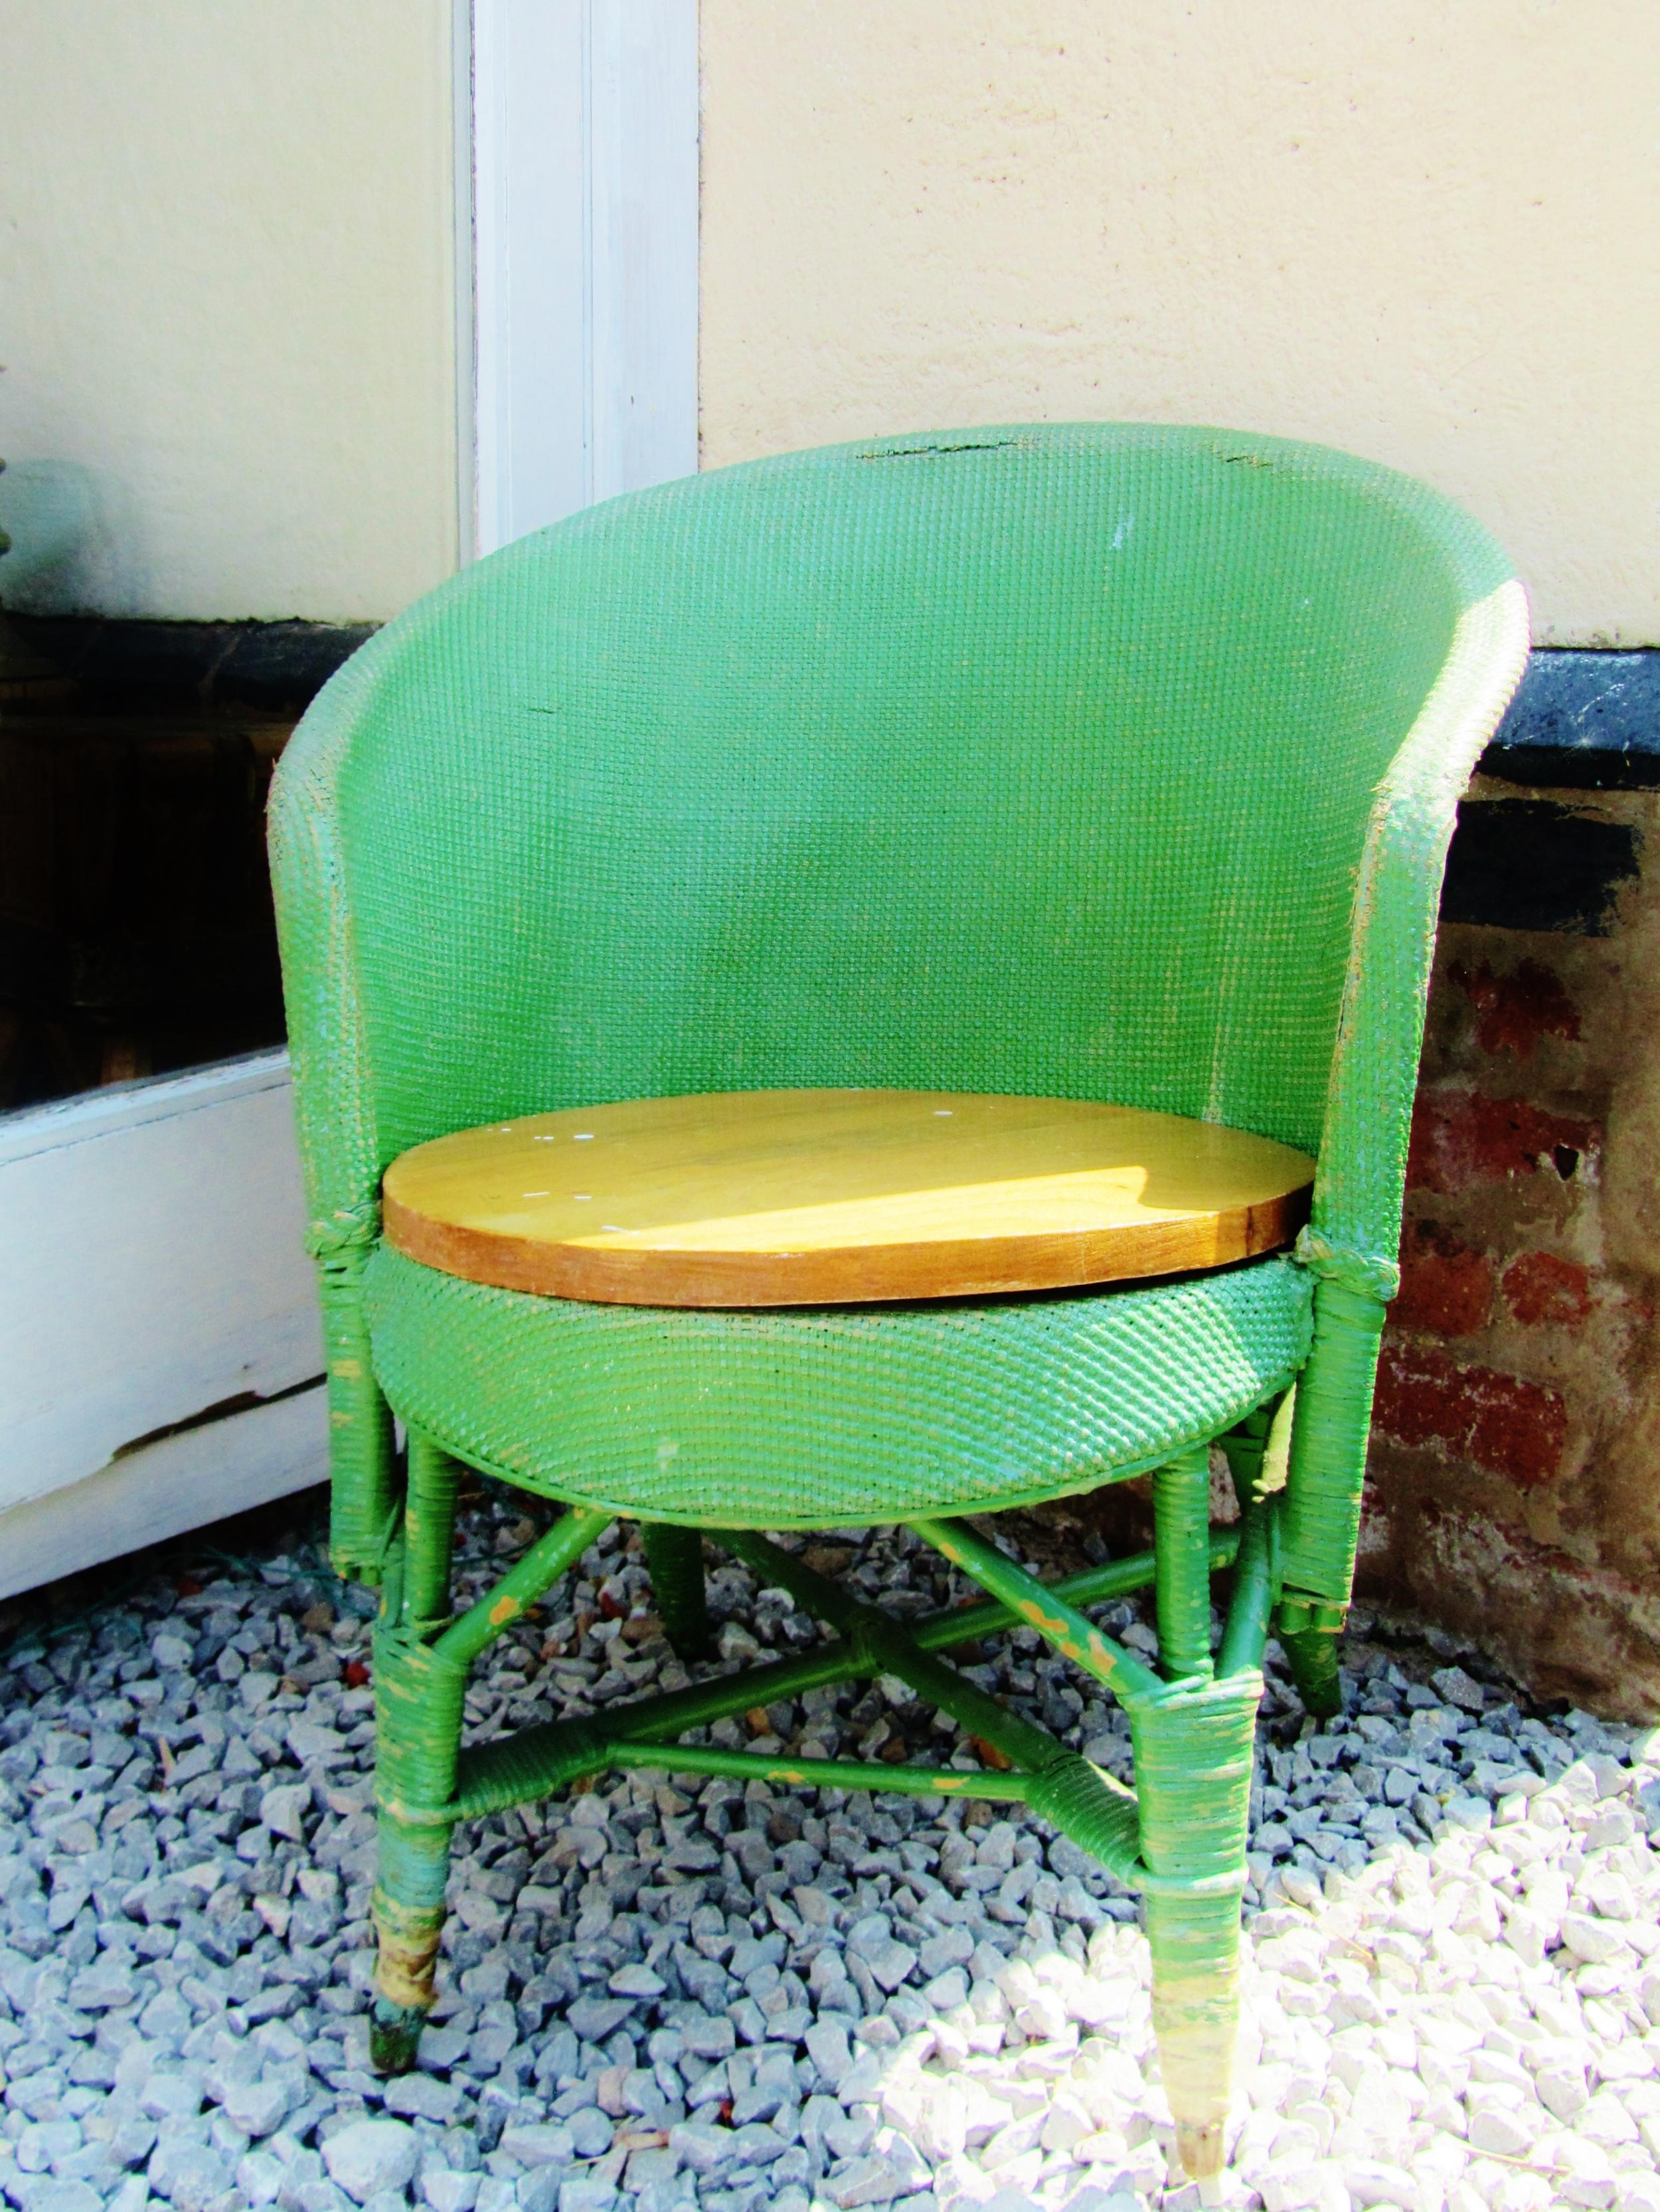 my fave green chair jade mellor.JPG